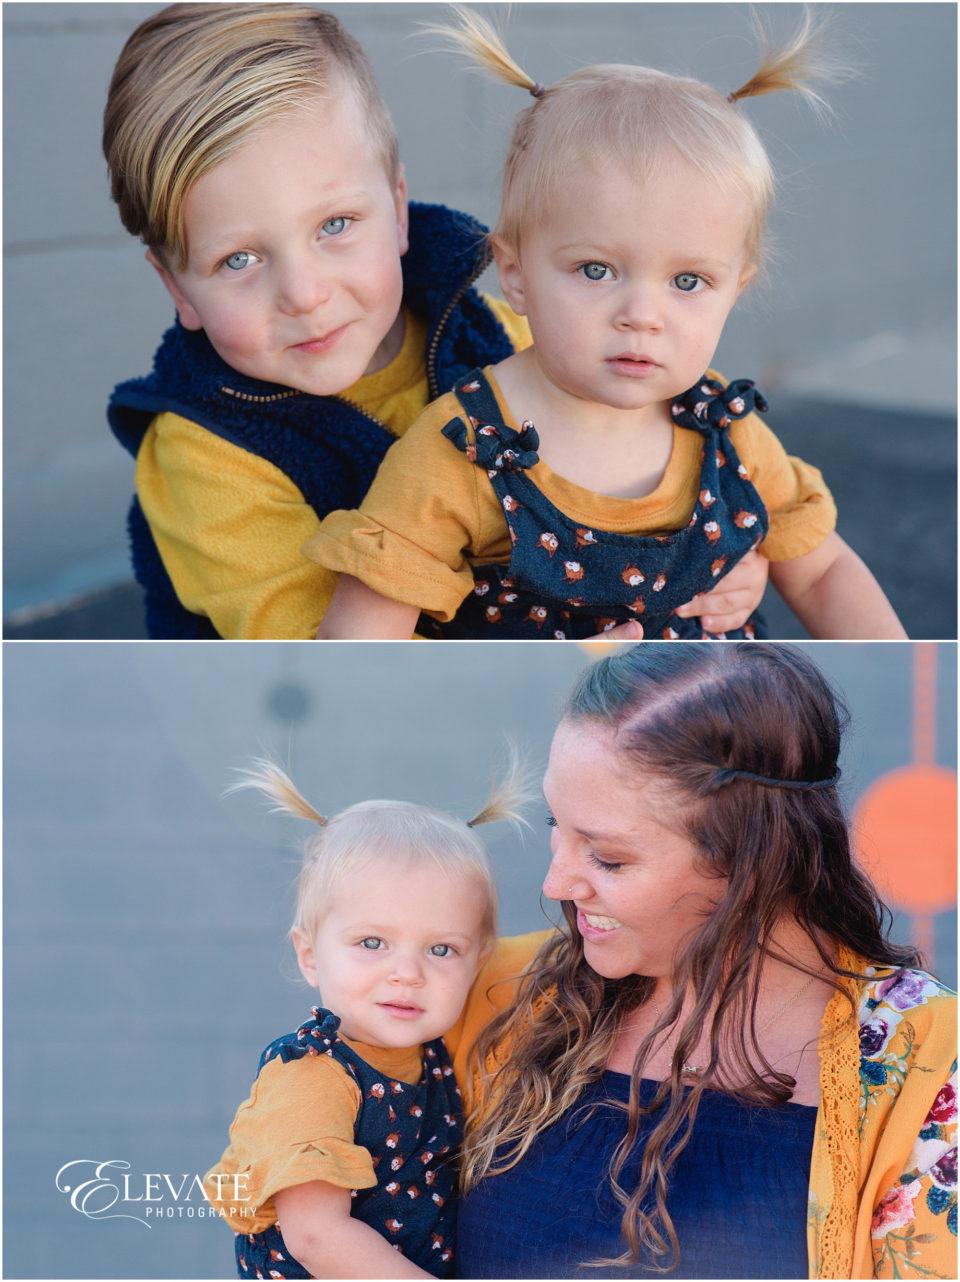 RiNo Denver Urban Family Photos